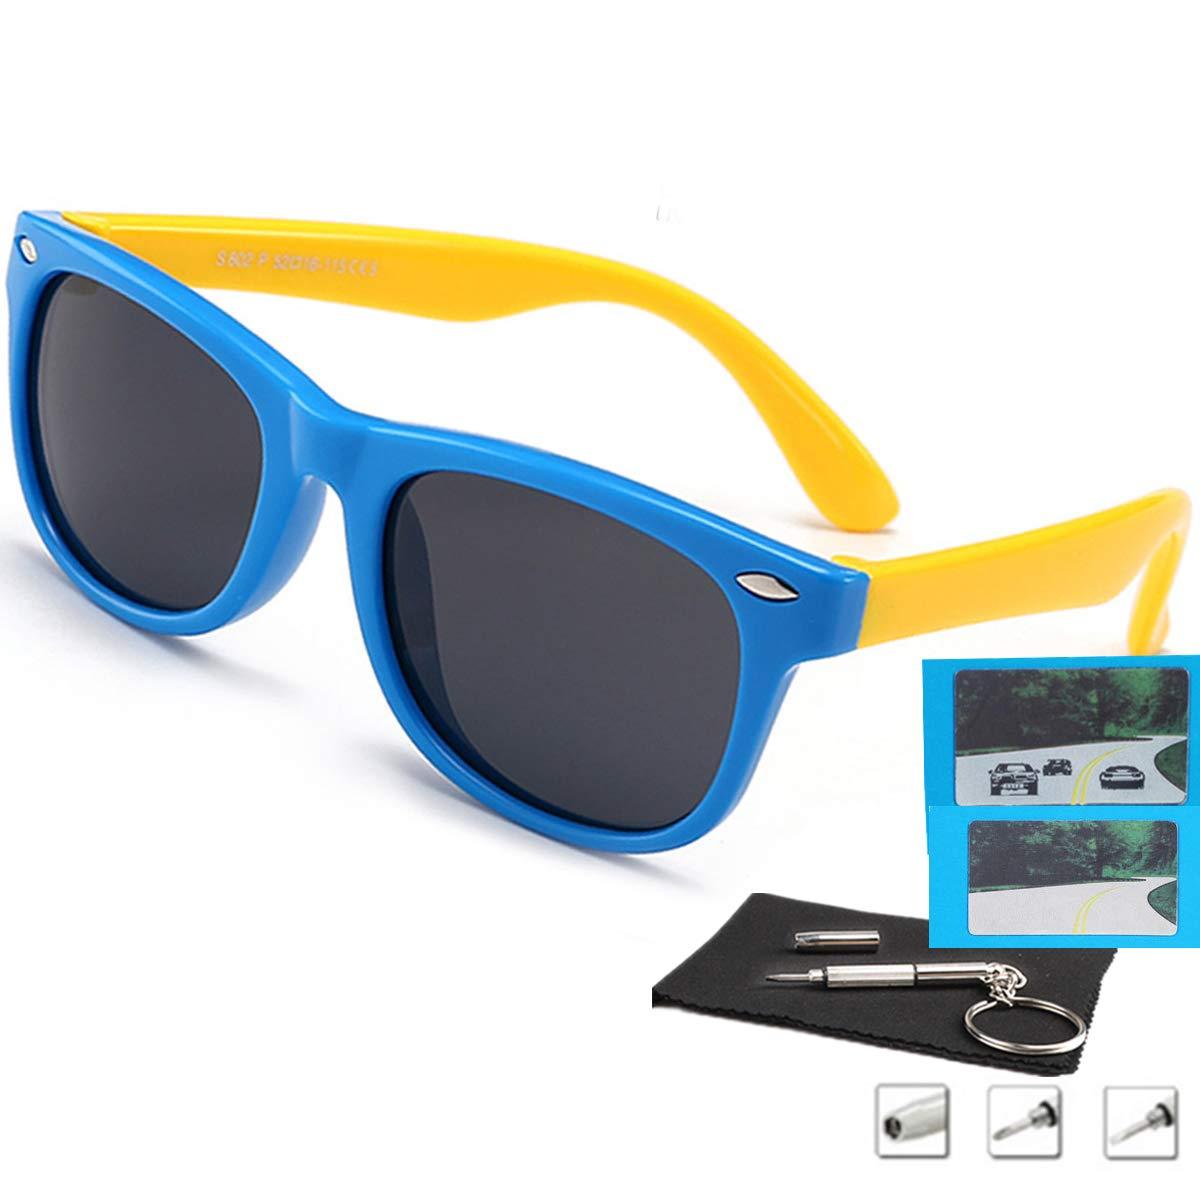 23c89486a3af ویکالا · خرید اصل اورجینال · خرید از آمازون · Kids Sunglasses Polarized kds  Sunglasses Girls